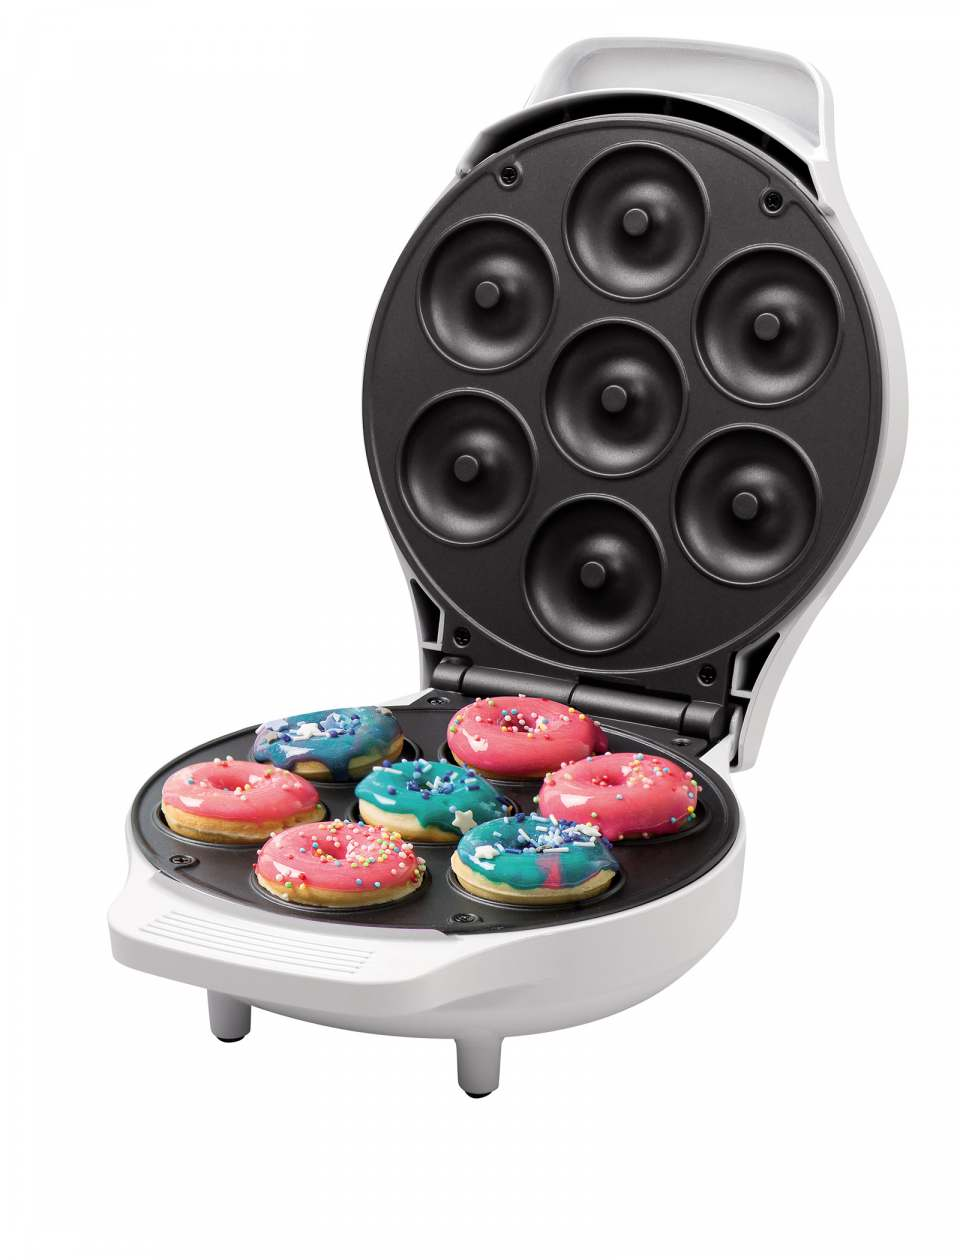 Rosenstein & Söhne Mini-Donut-Maker CM-200 bereitet auch Mini-Bagels.